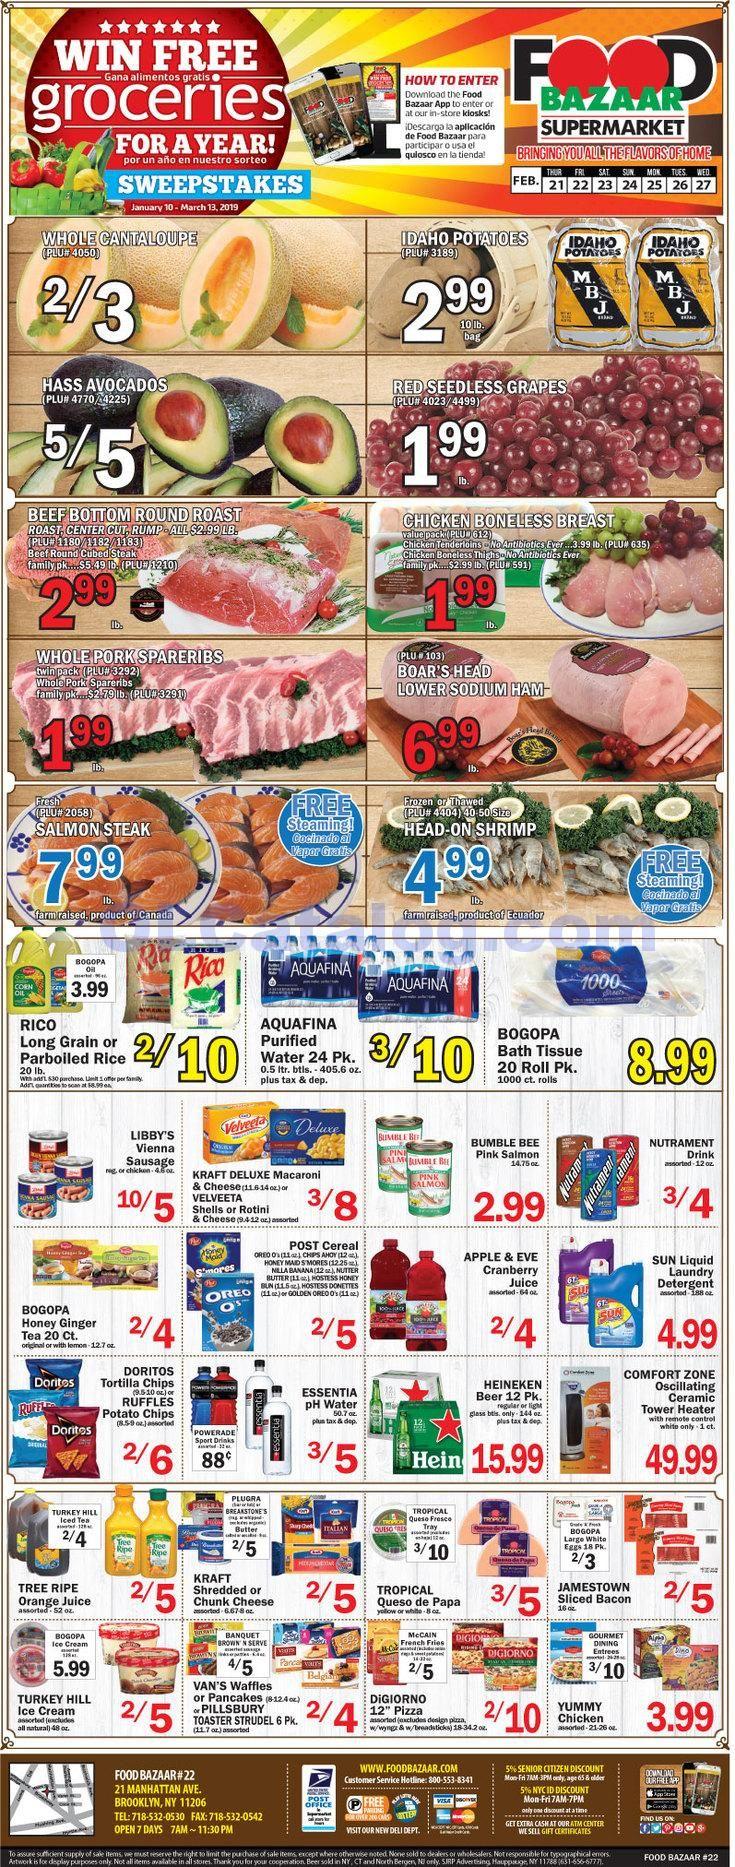 Food bazaar weekly ad february 21 27 2019 do you know